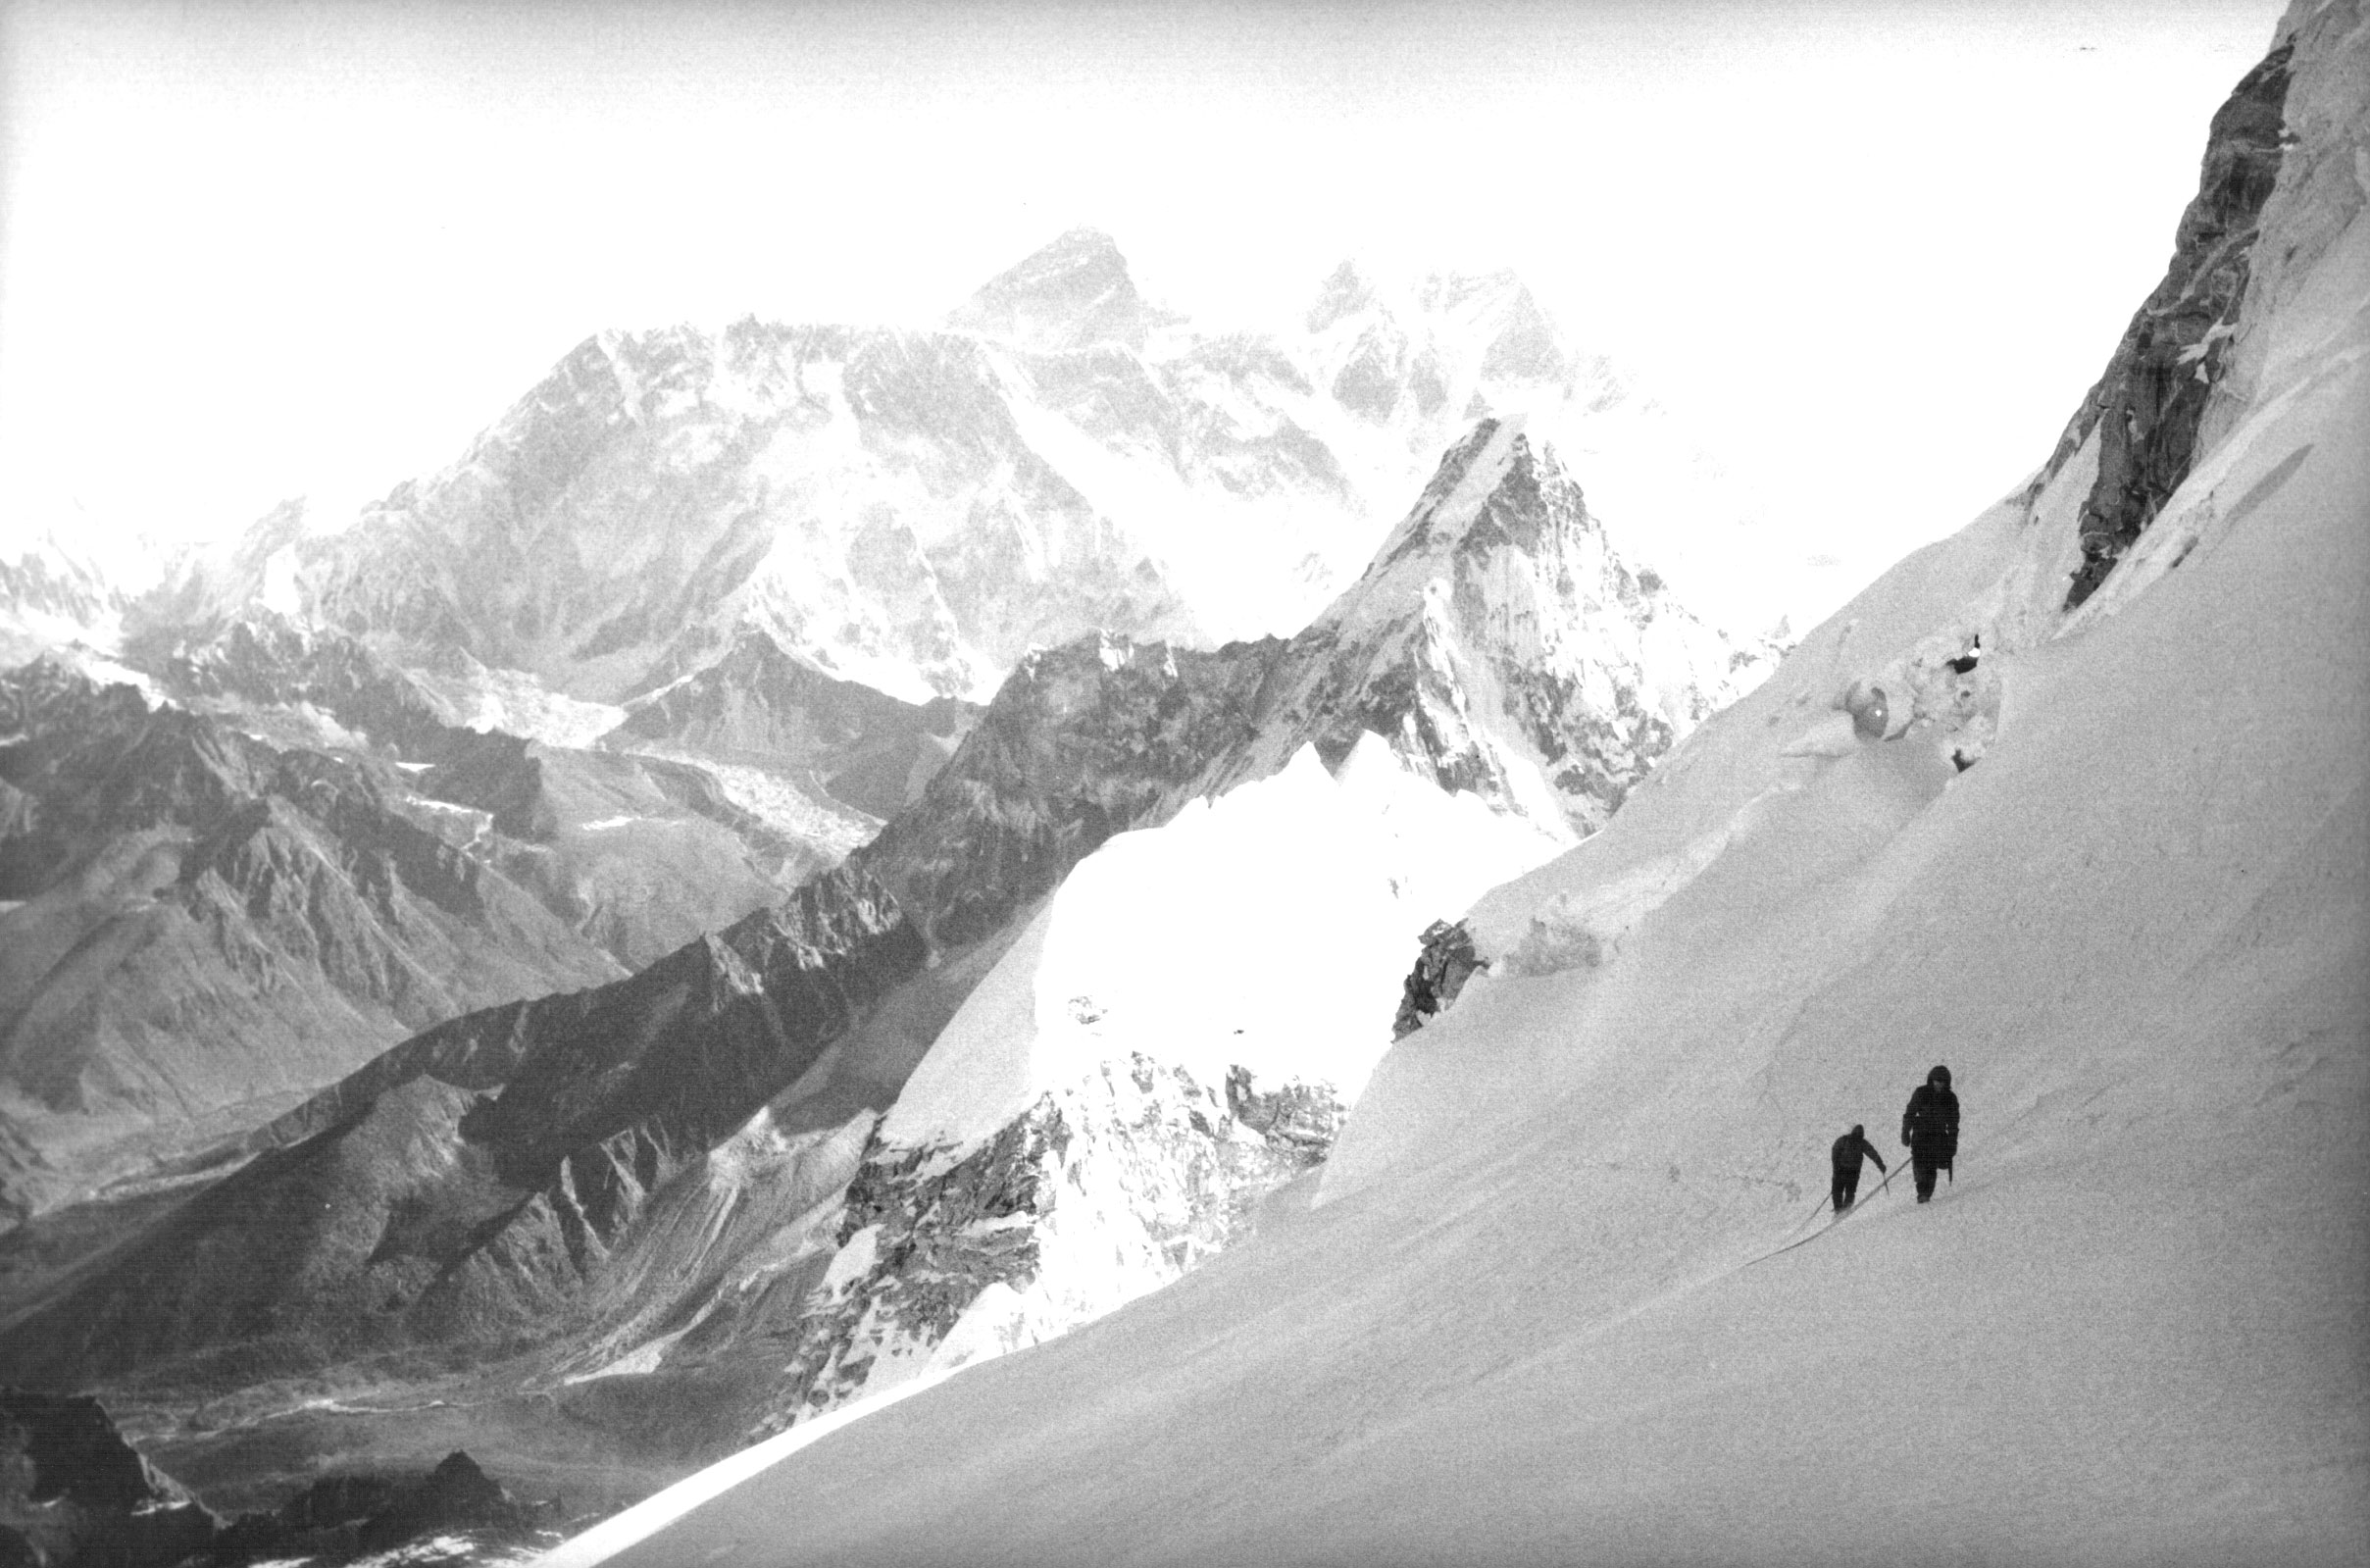 Tom_Frost_-_Climbers_on_Kangtega_-_1986.jpg